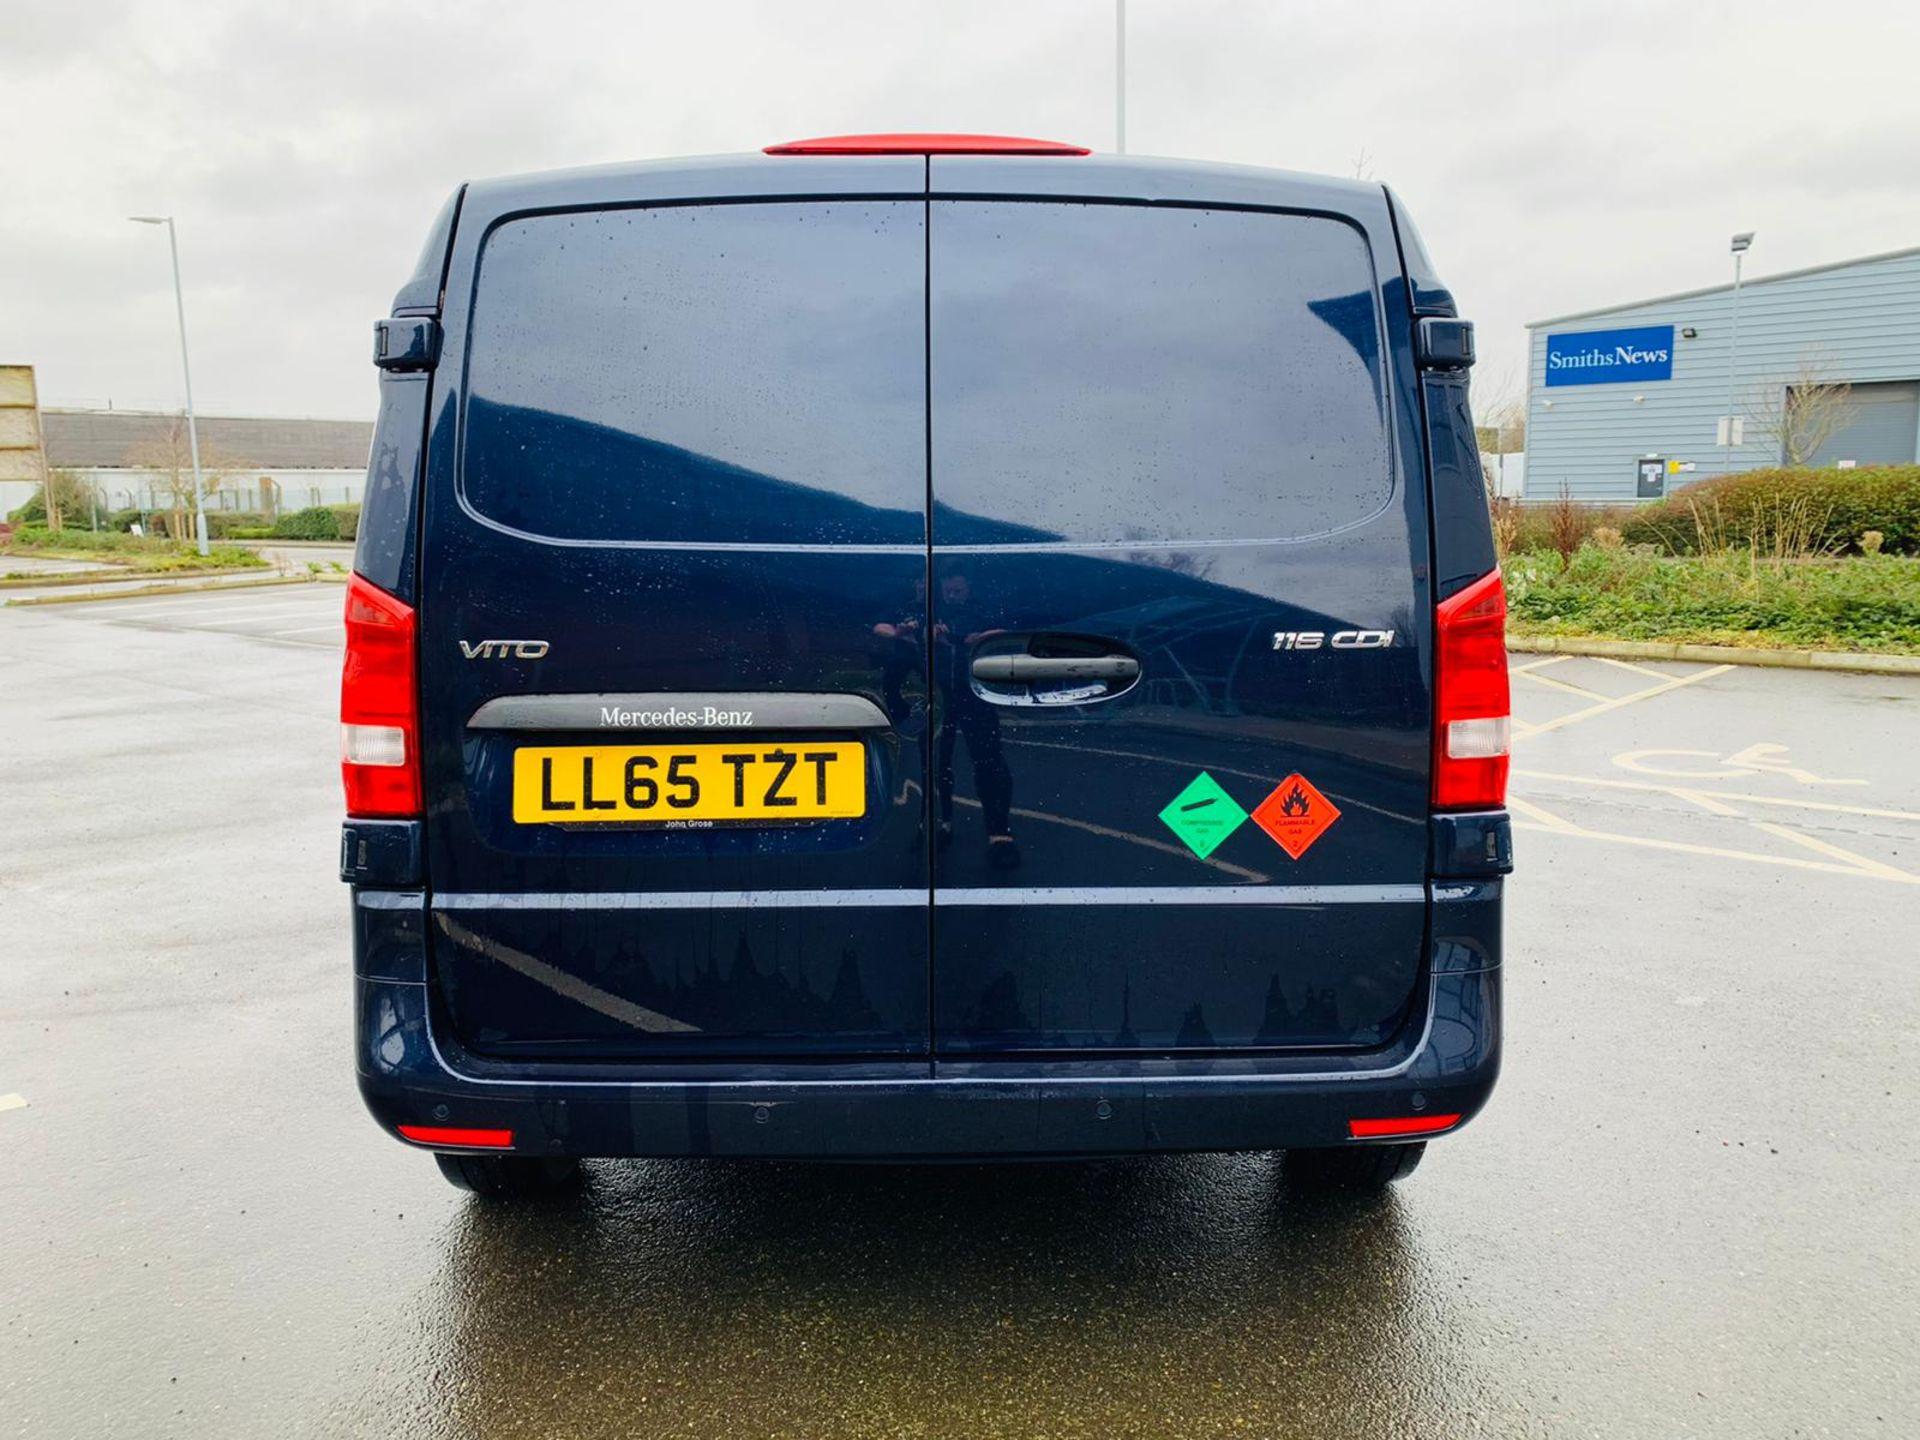 (RESERVE MET) Mercedes Vito 116Cdi Sporty Spec (161 BHP) Bluetech 6 Speed Van - 2016 Model - AC - Image 6 of 28